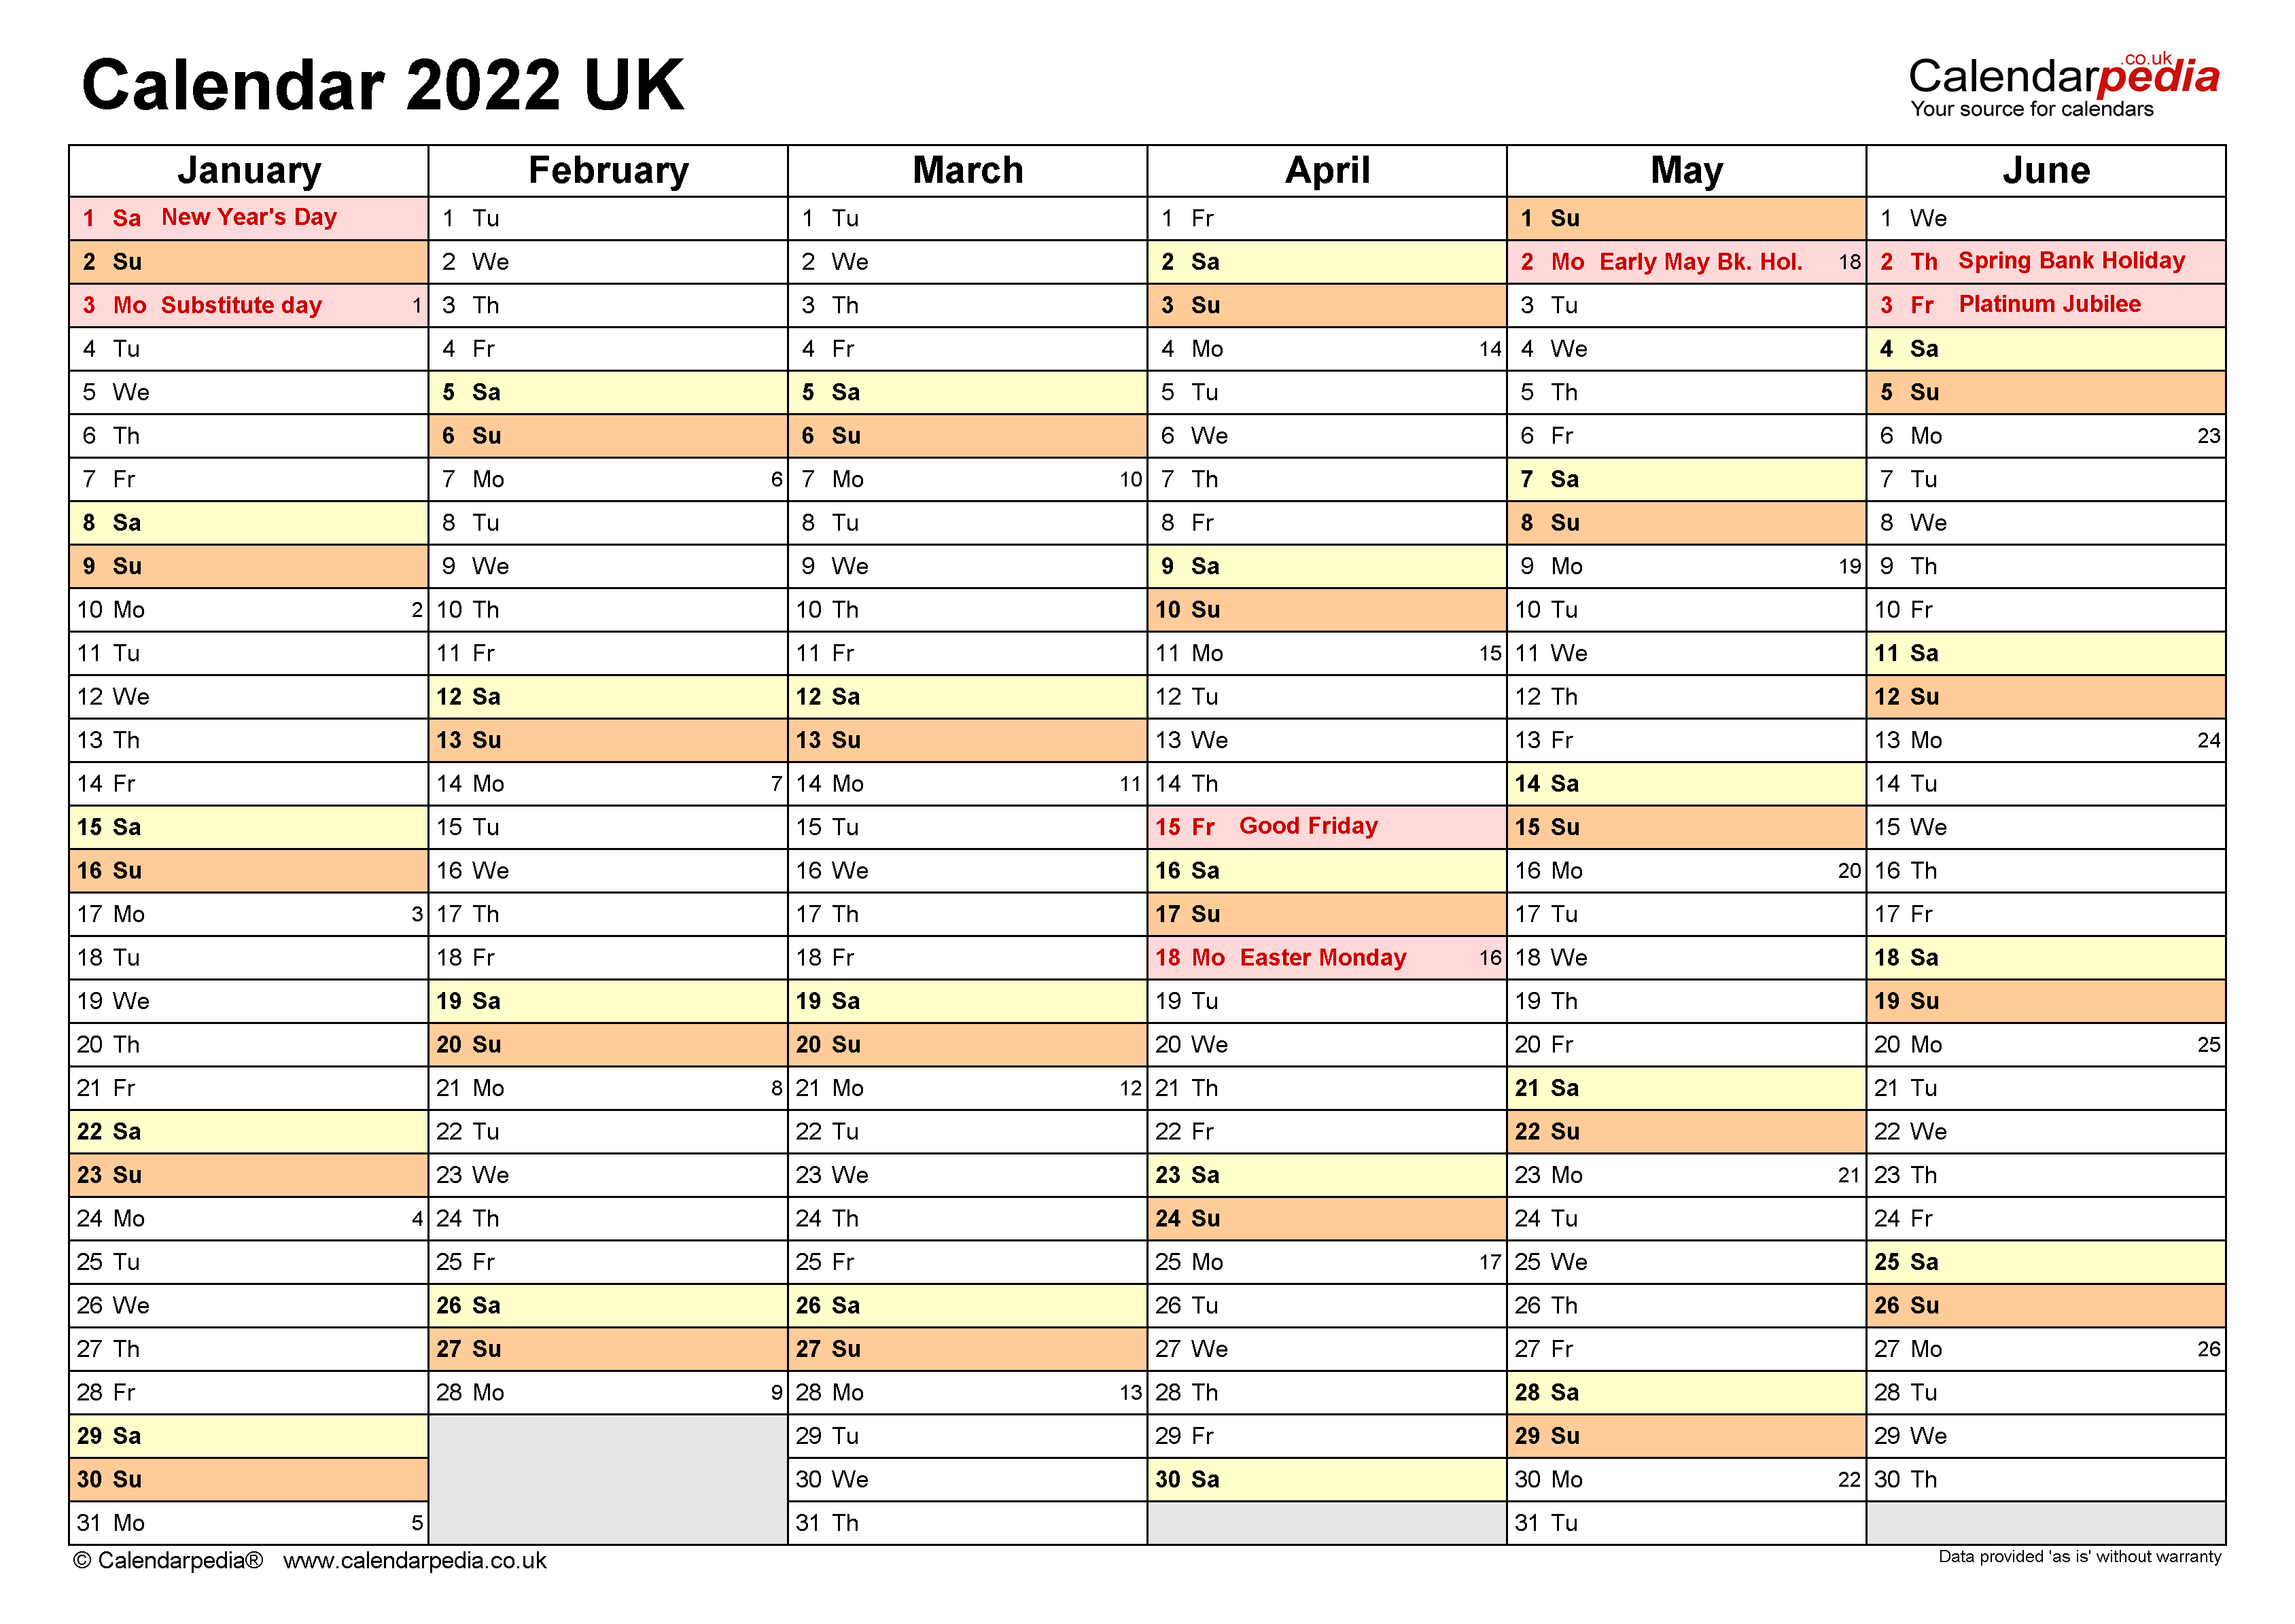 Calendar 2022 (UK) - free printable PDF templates